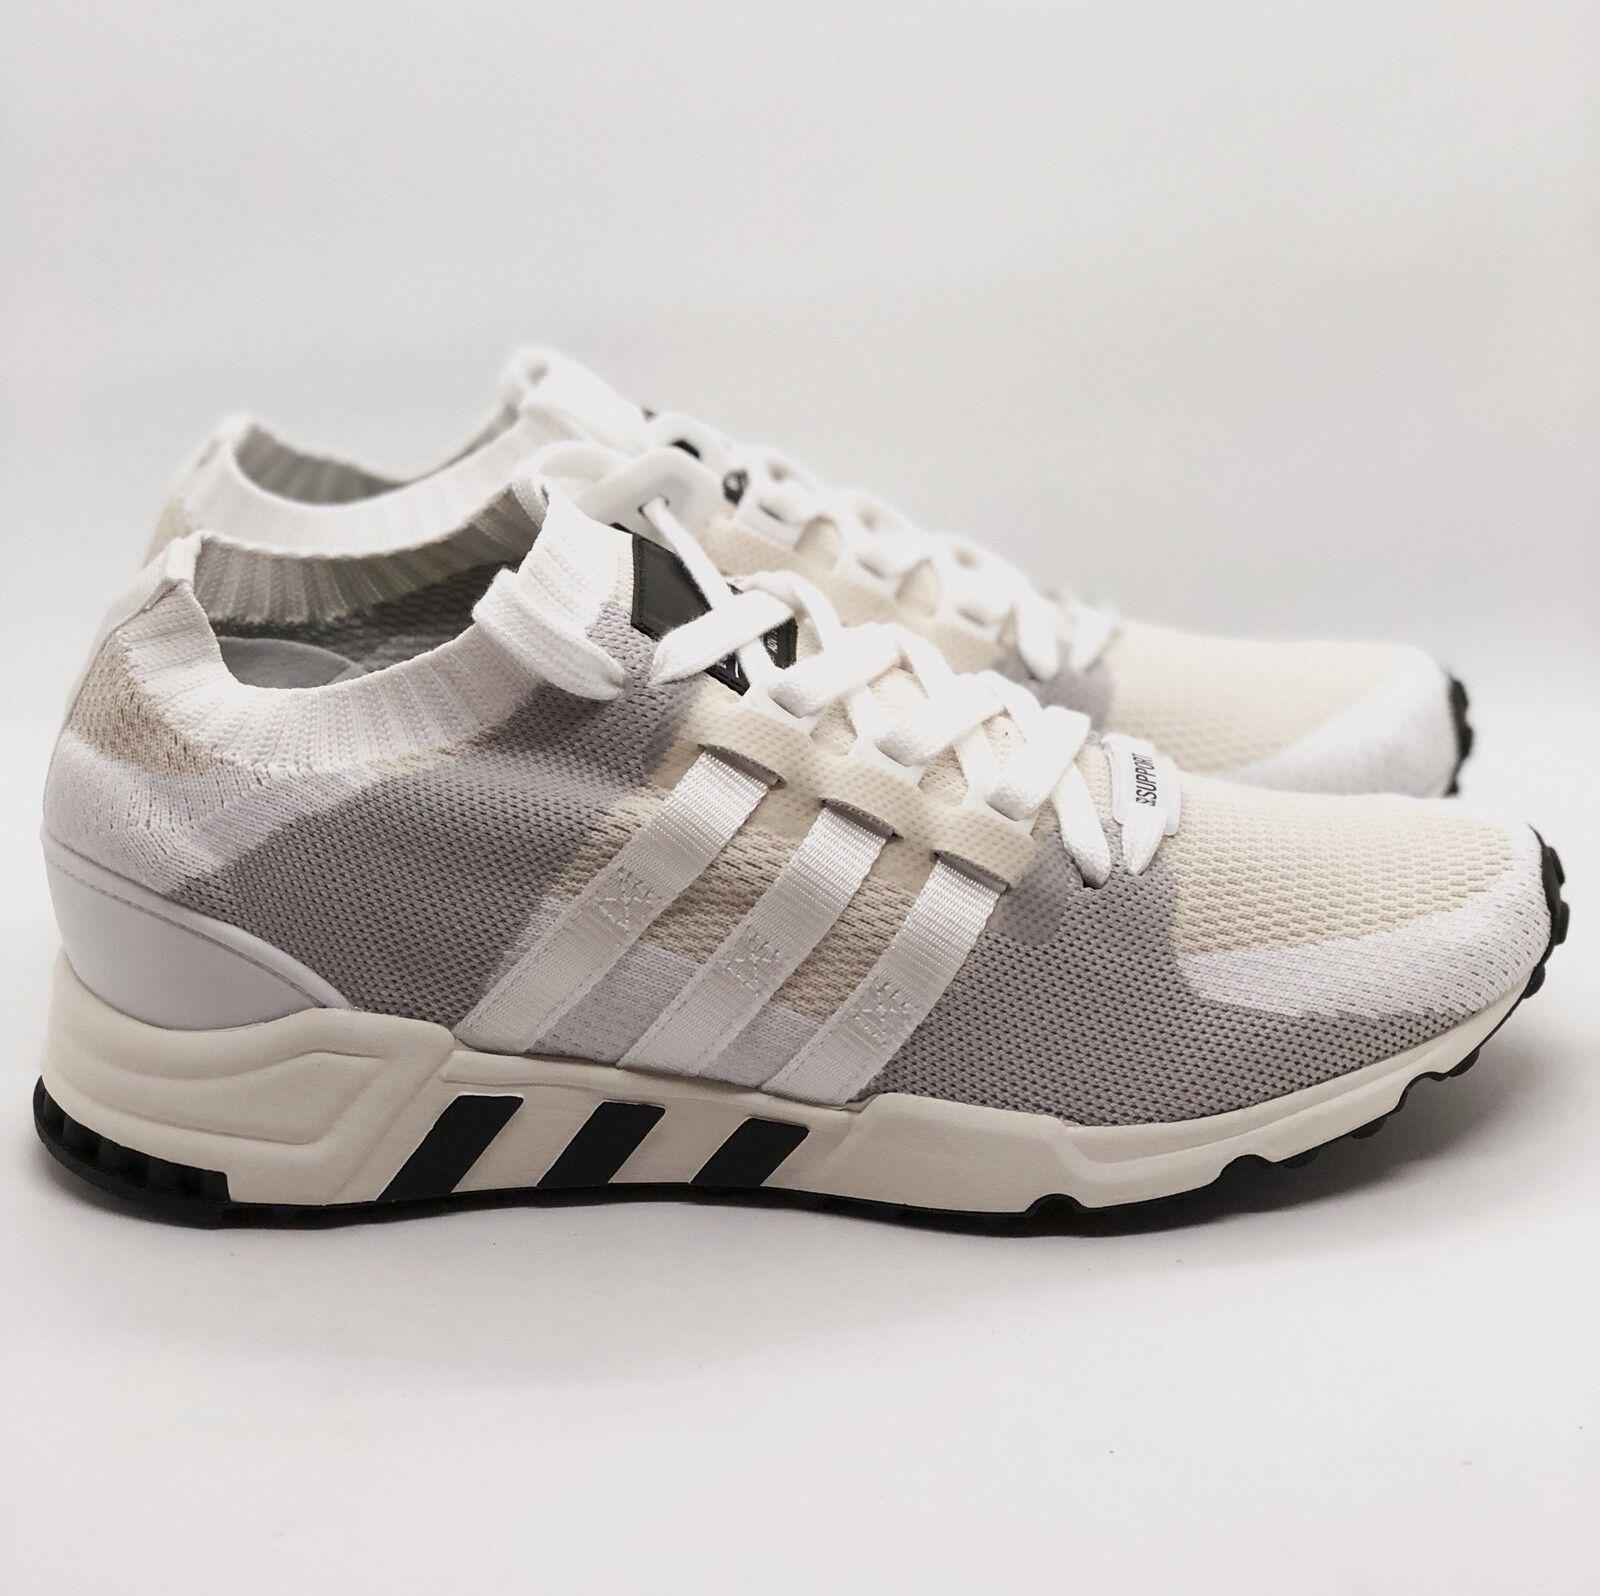 Adidas 8.5 EQT SUPPORT RF PK (BA7507) Men's Sneaker Size 8.5 Adidas White/ Black/ Off White 373264